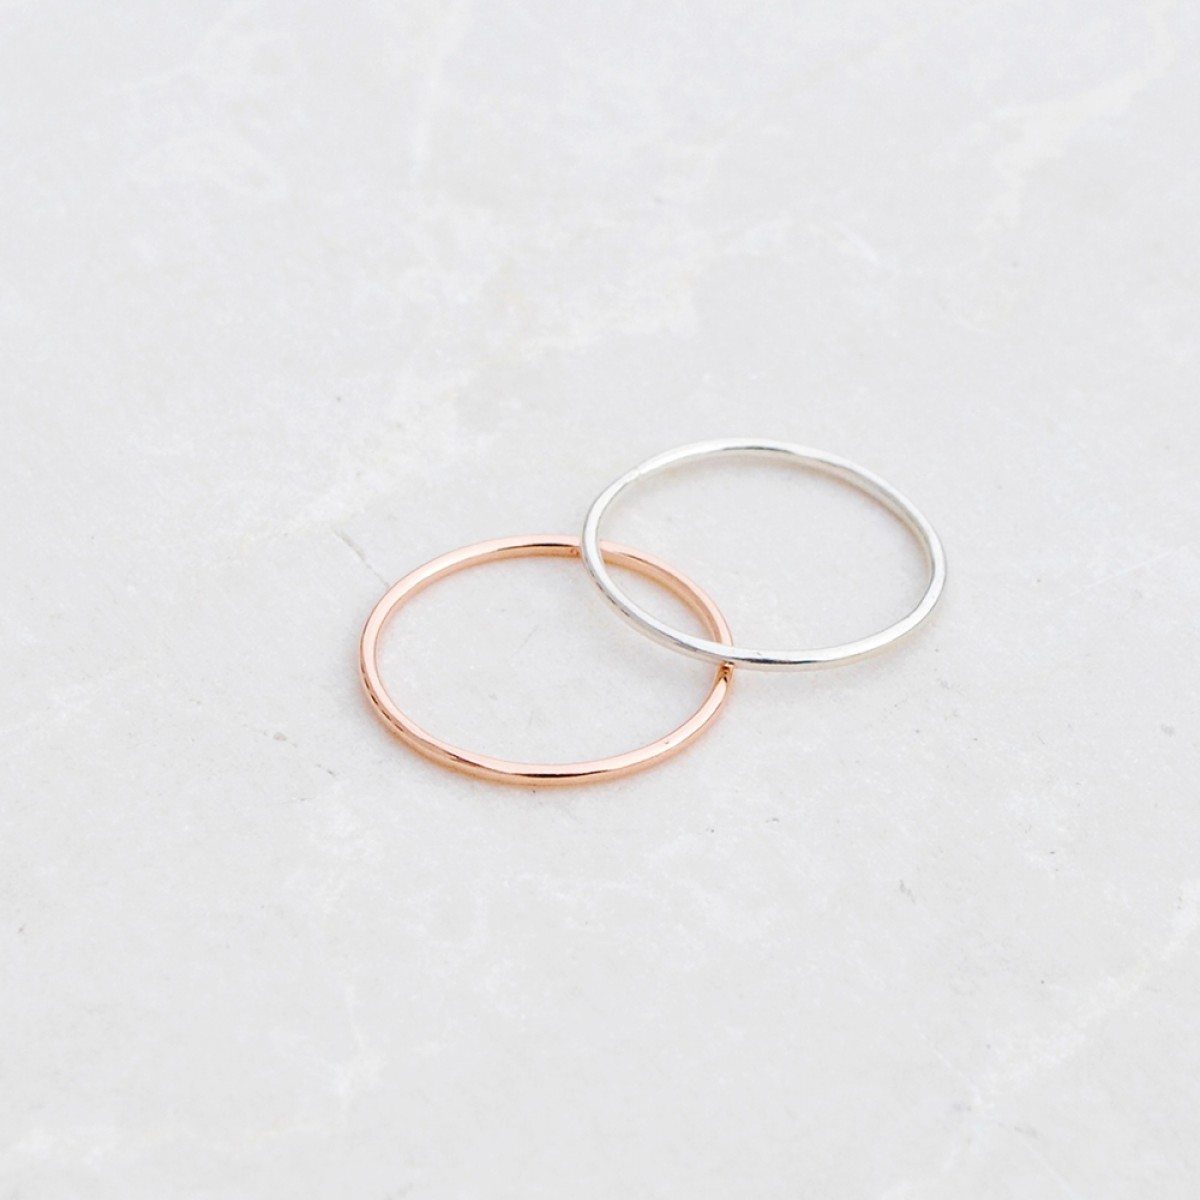 iloveblossom SIMPLE THINGS RING // rosé